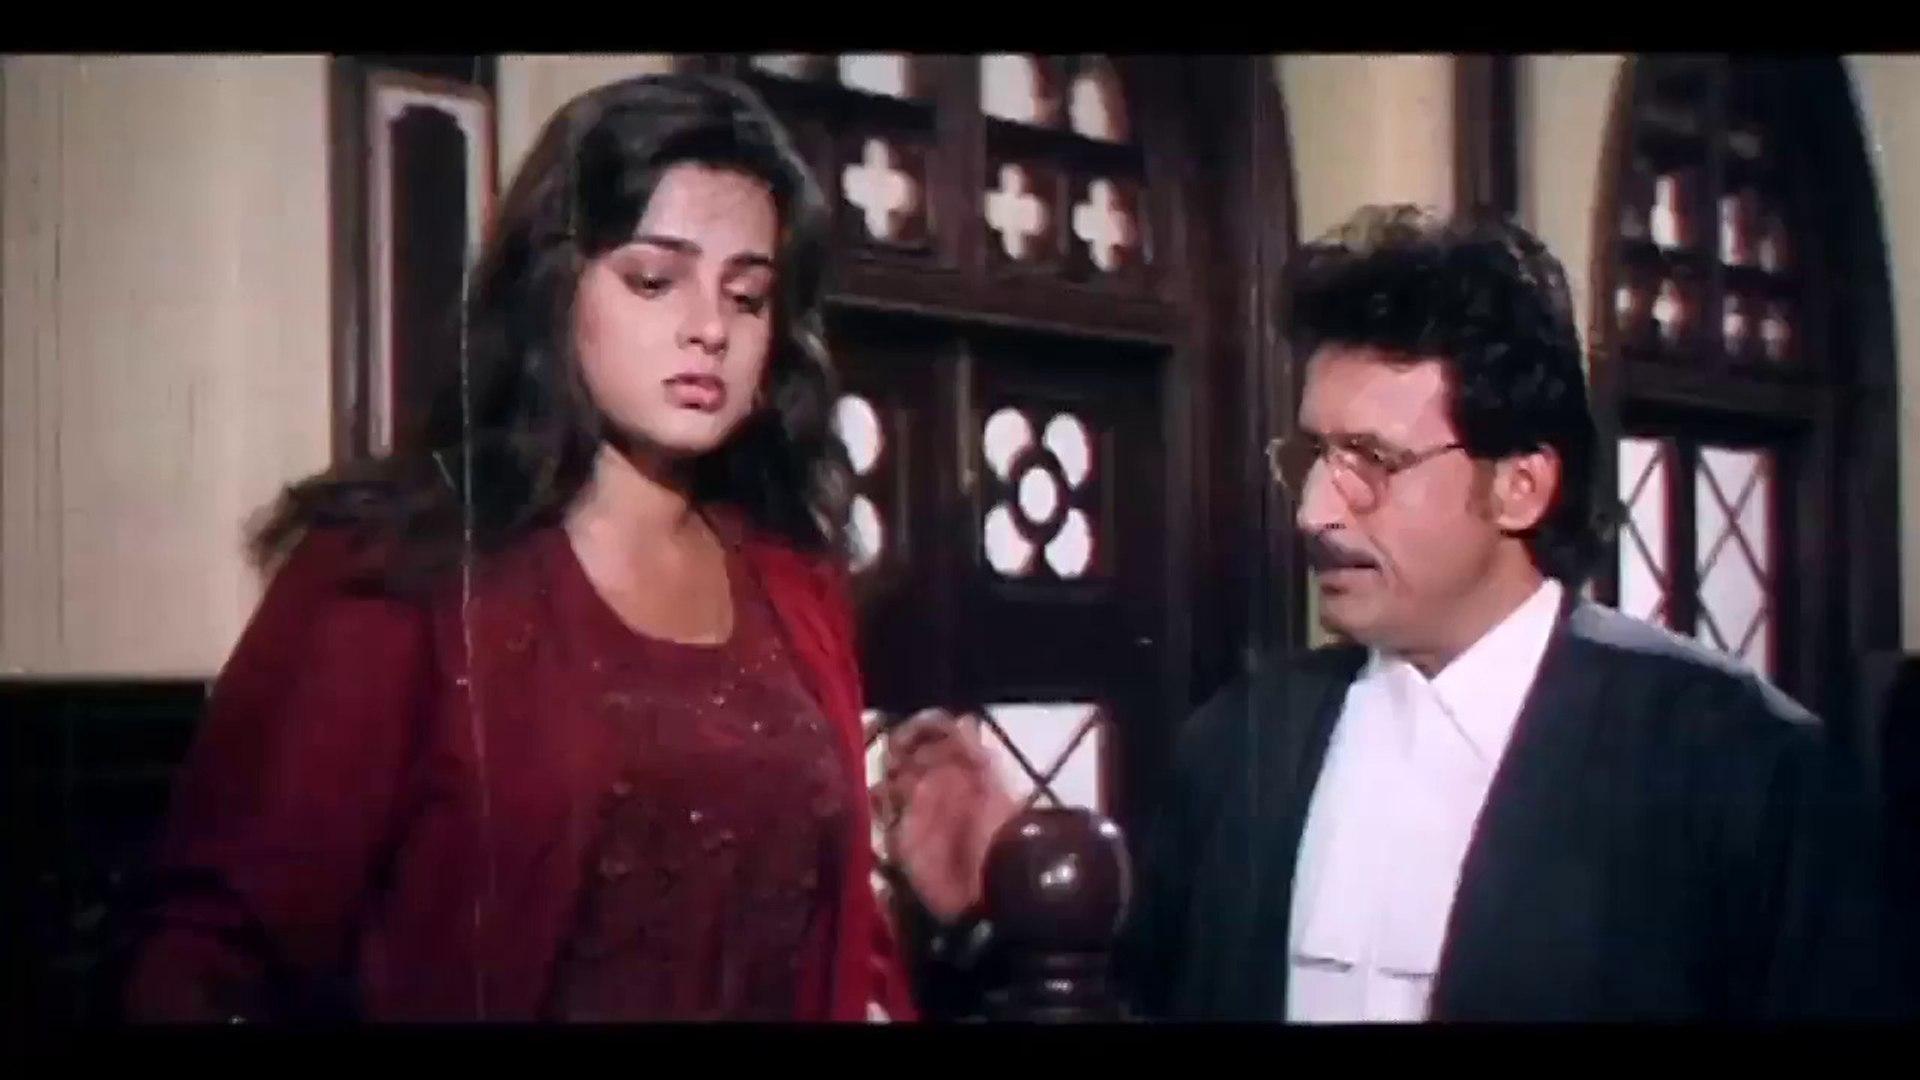 DILBAR | FULL HINDI MOVIE | PART 11 OF 11 | BEST HINDI MOVIES | POPULAR HINDI FILMS